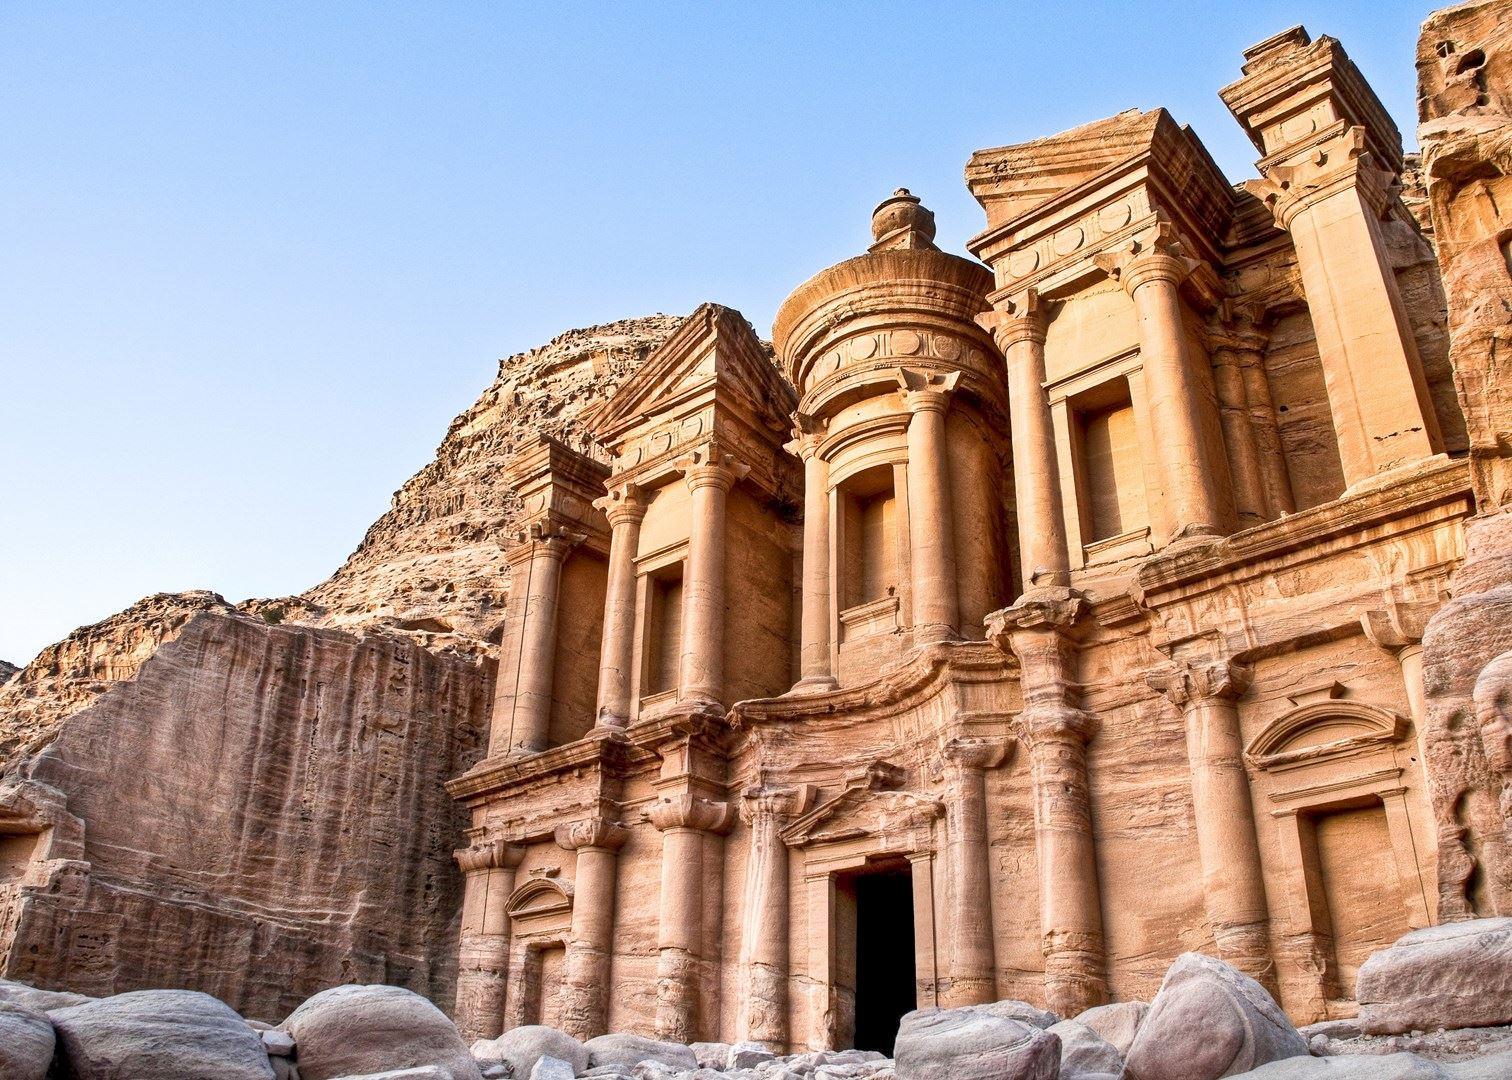 Visit Petra on a trip to Jordan | Audley Travel